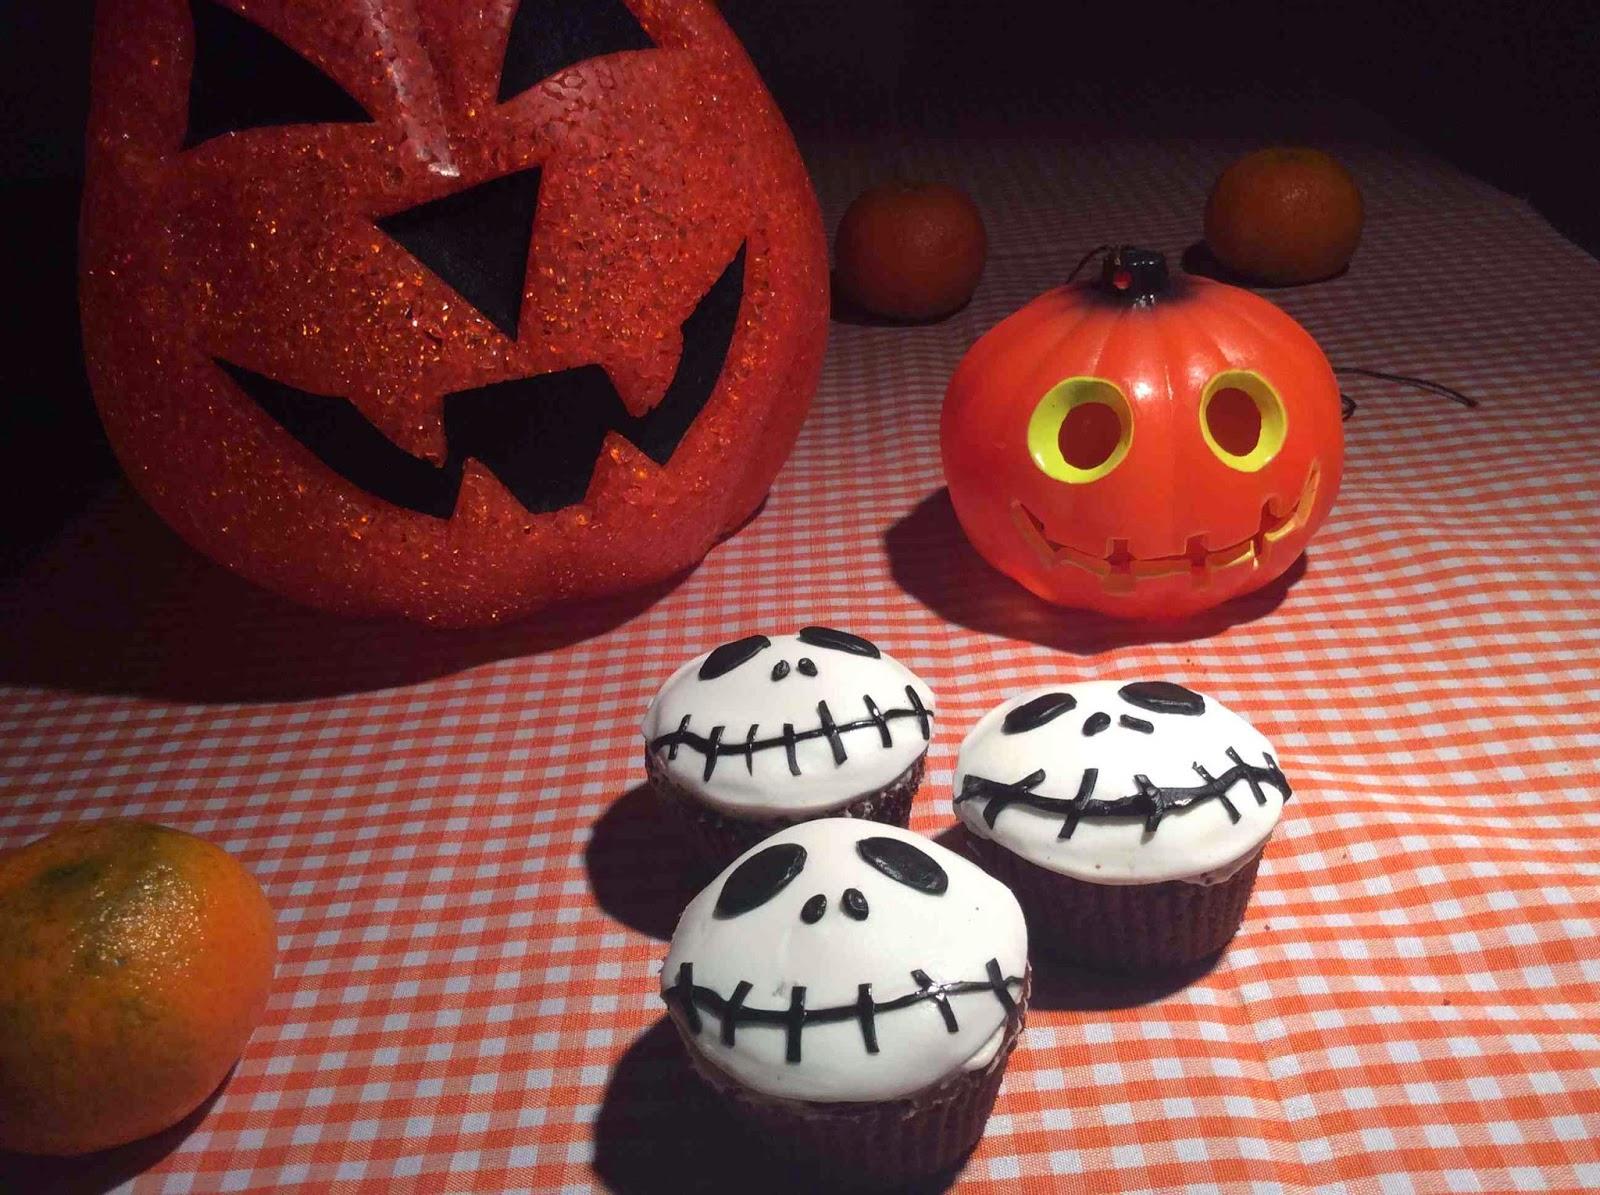 Sugerencia de presentación Cupcakes de Halloween